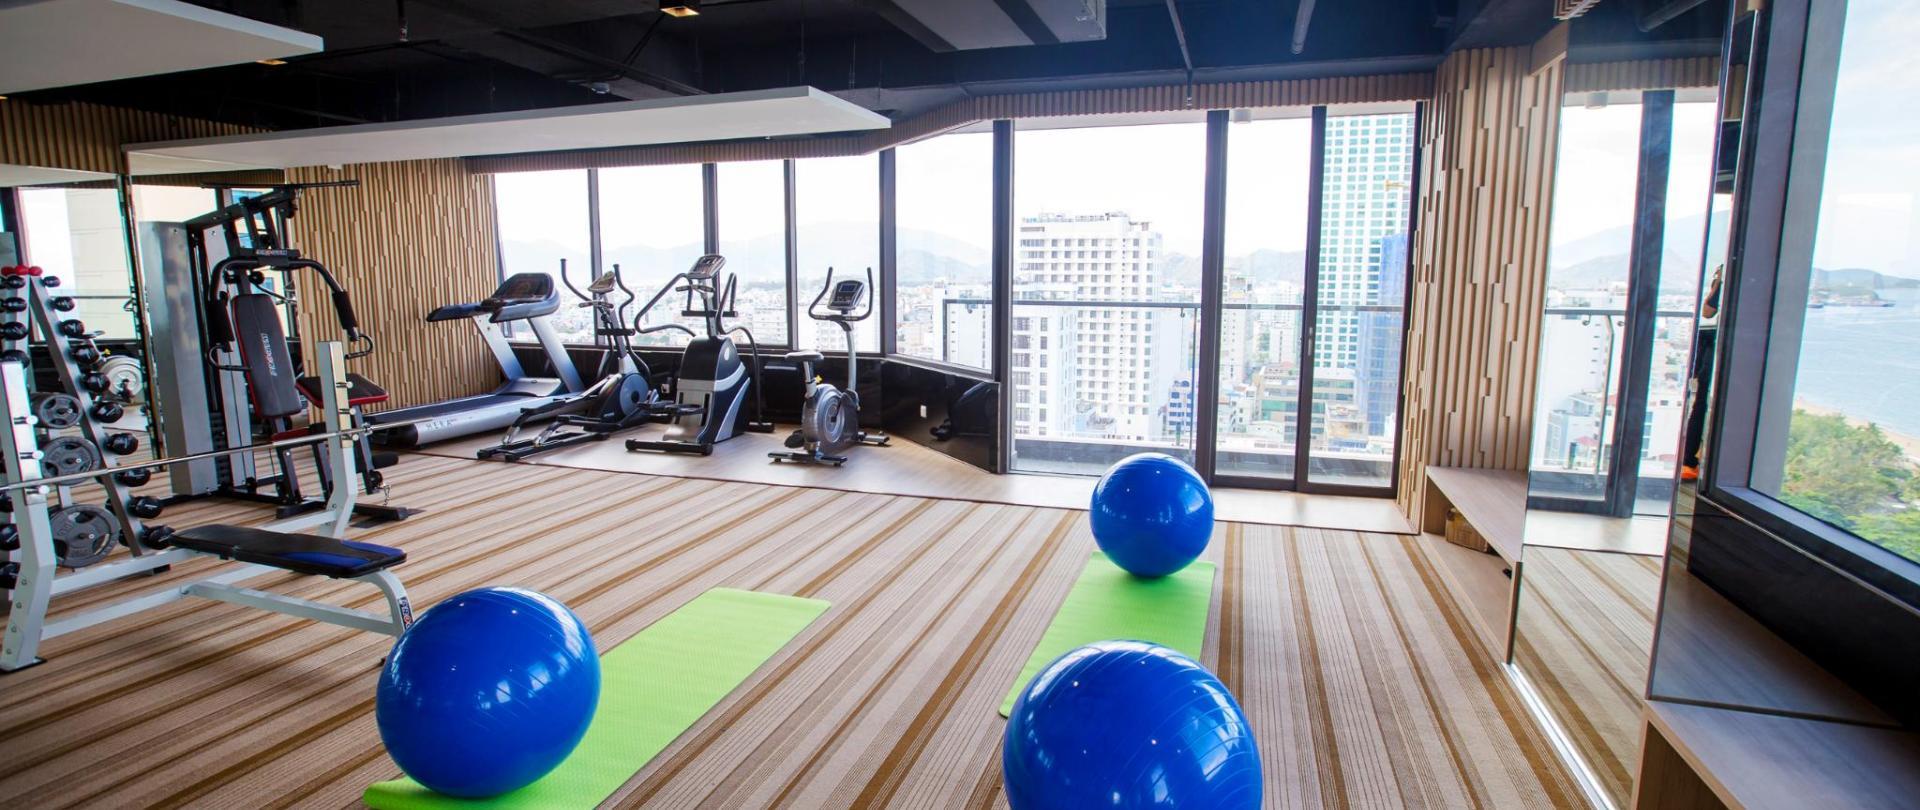 Fitness Centre (3) a.jpg